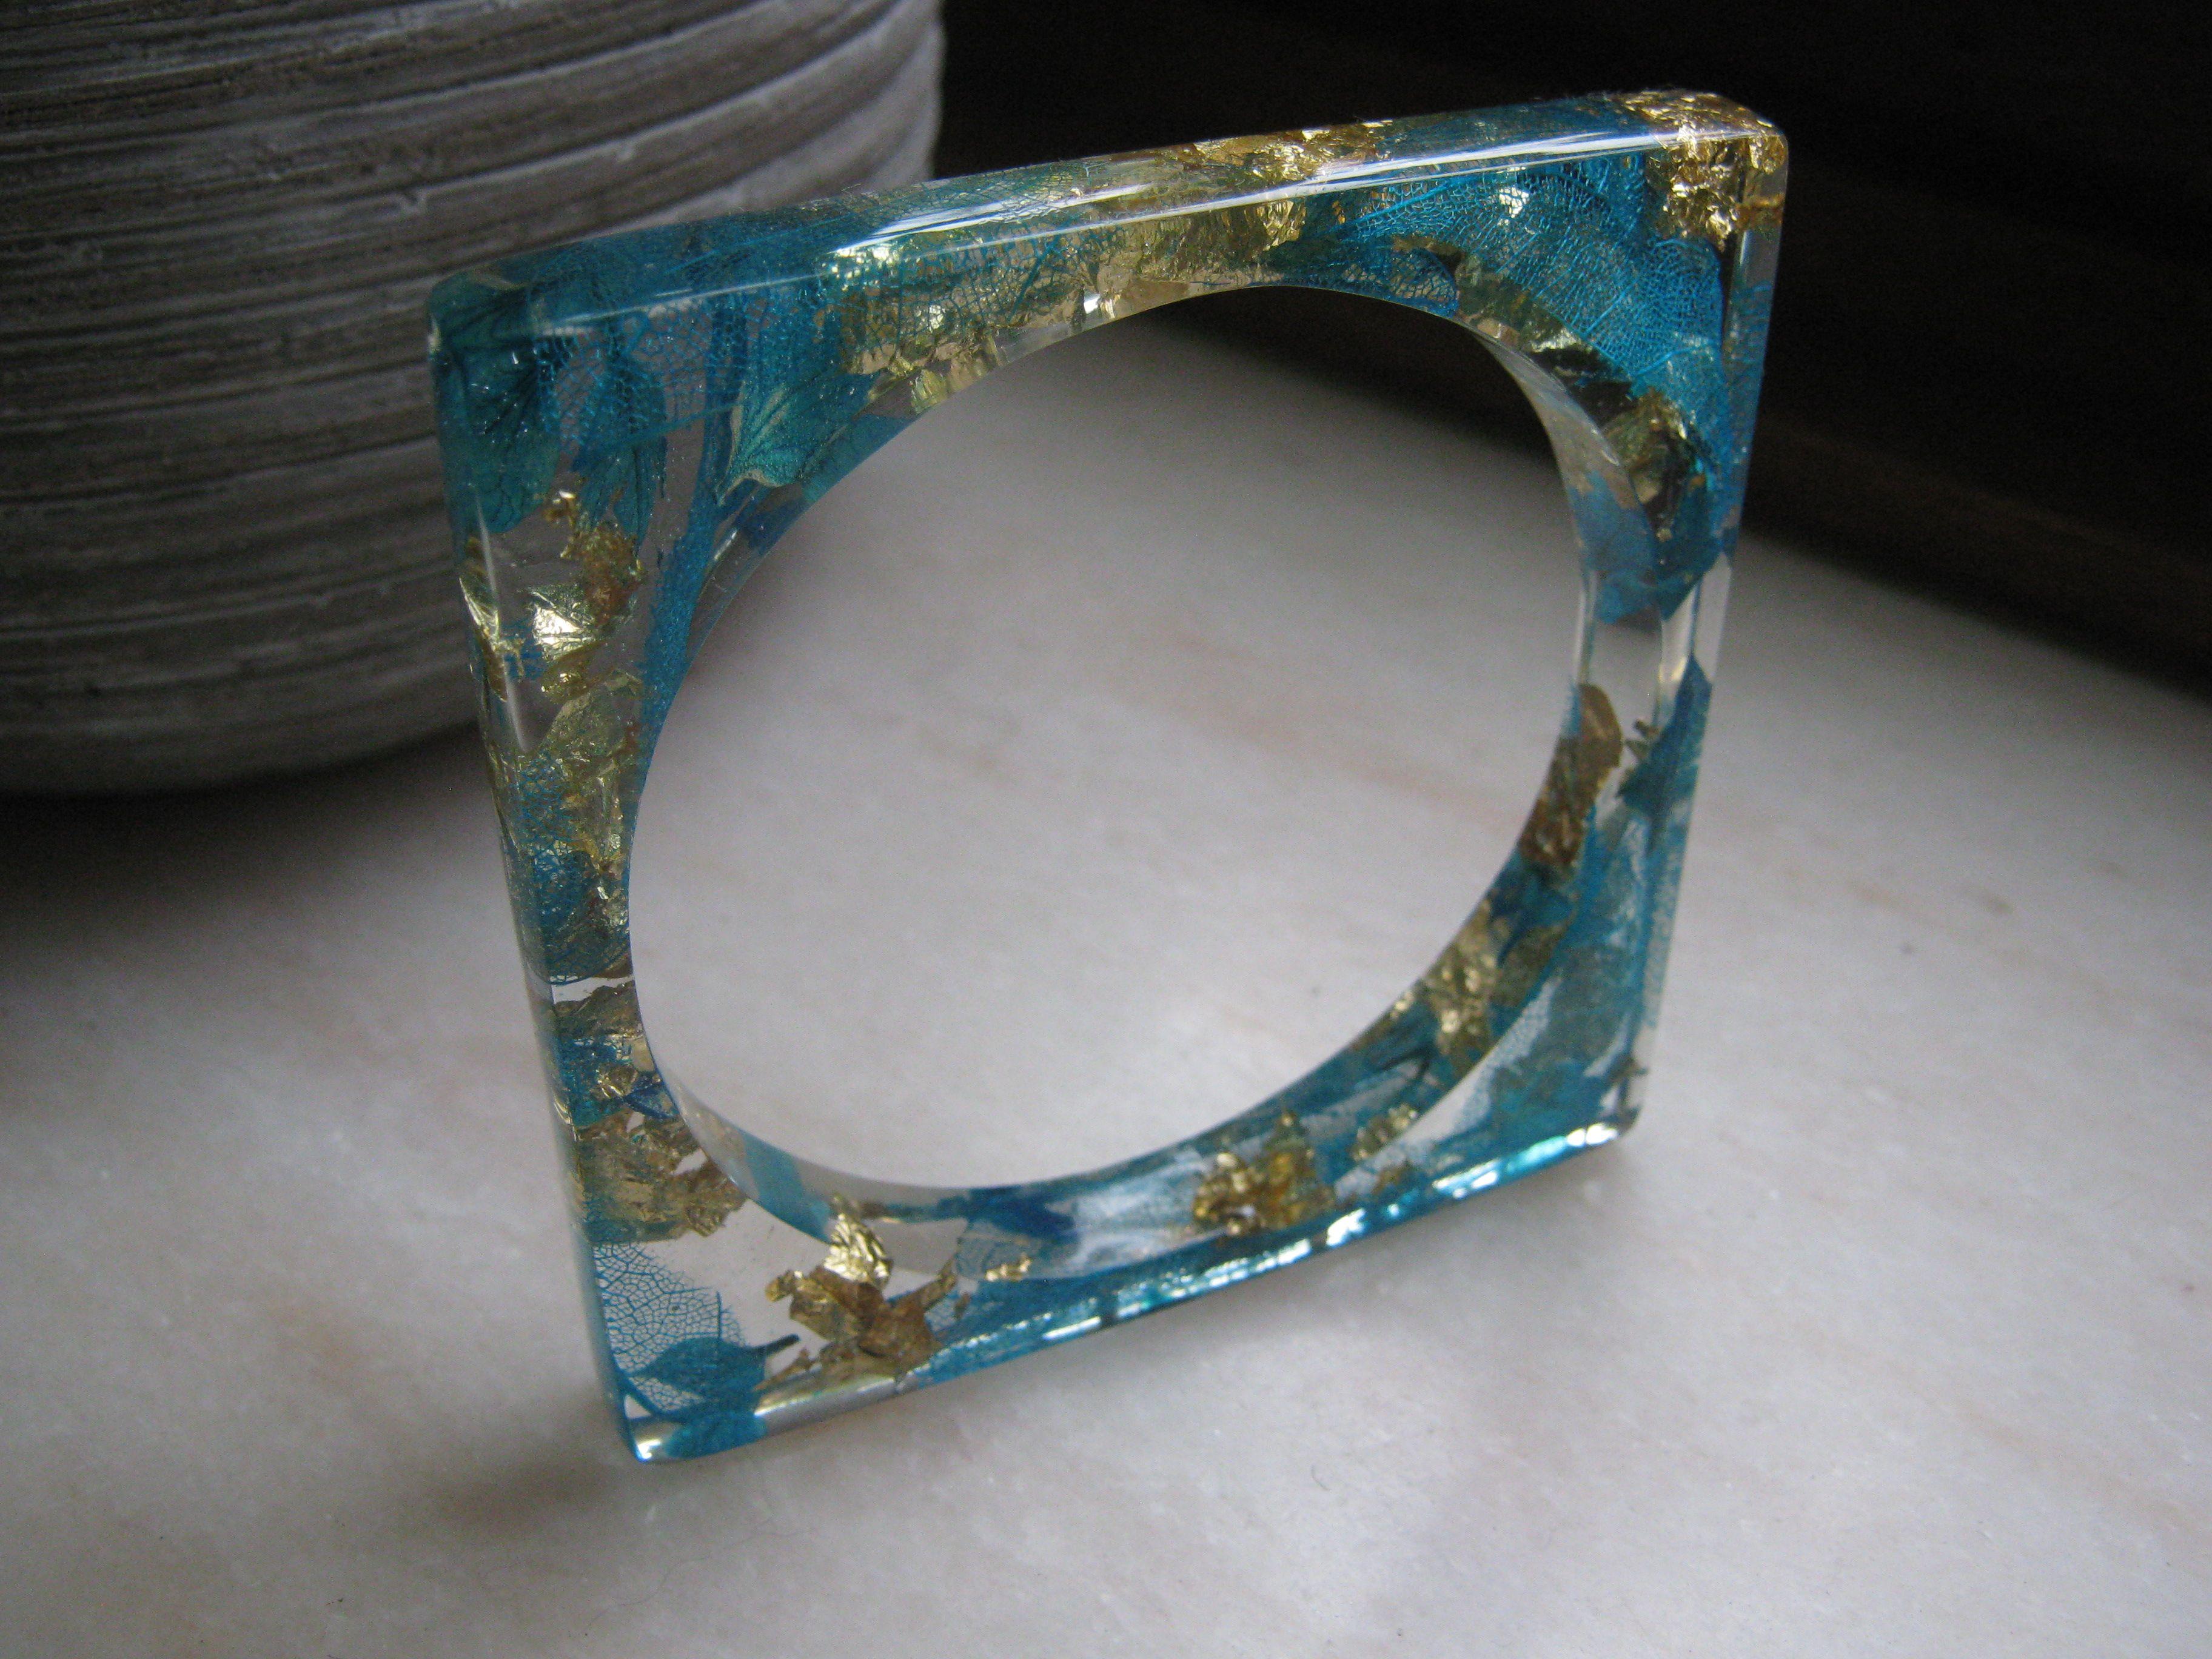 bracelet en r sine poxy cristal atelier de jadec. Black Bedroom Furniture Sets. Home Design Ideas